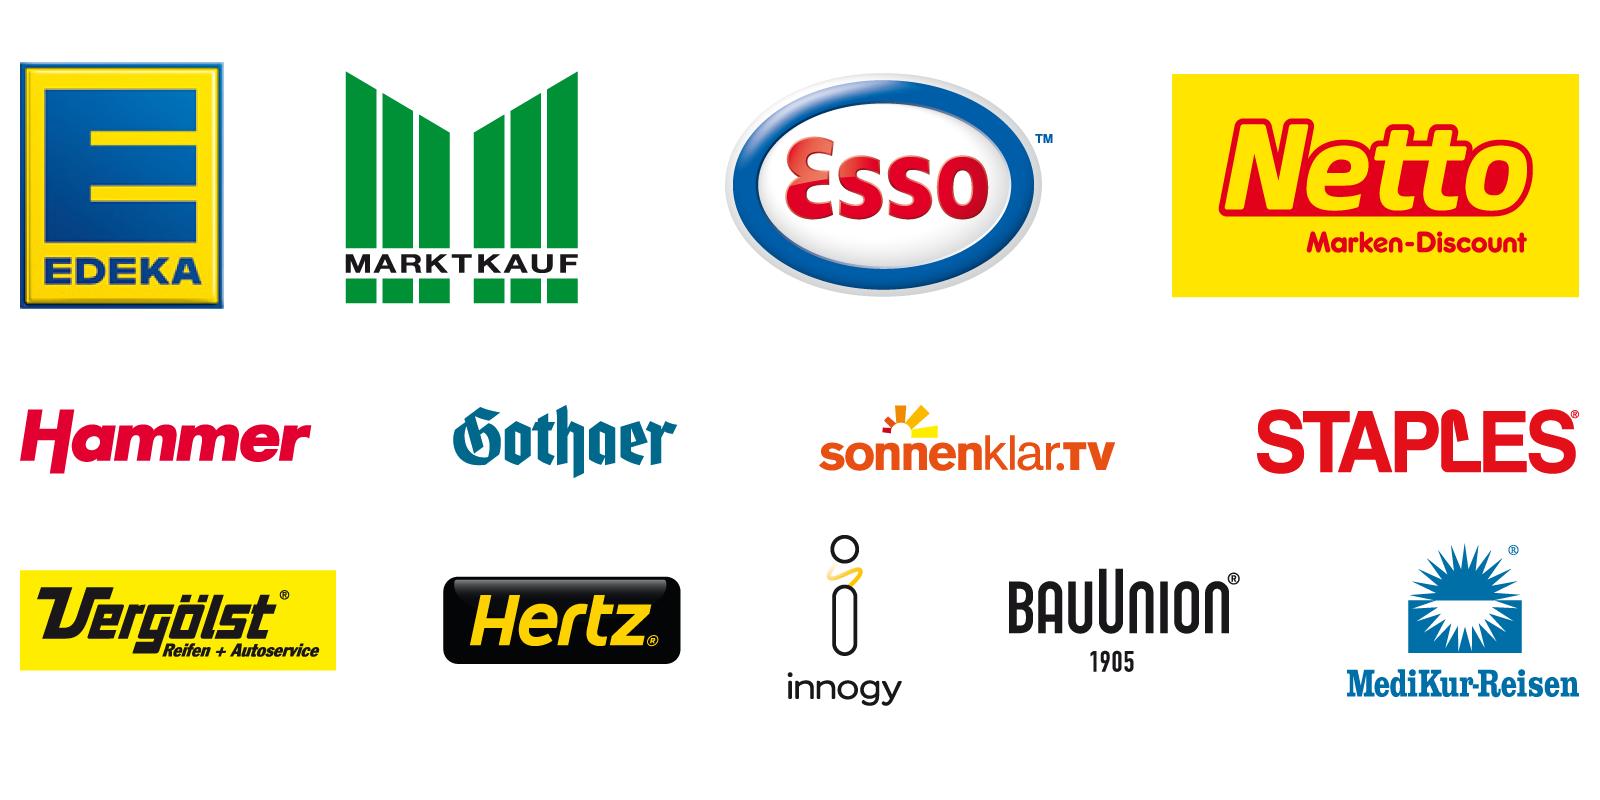 DeutschlandCard Partner Logos